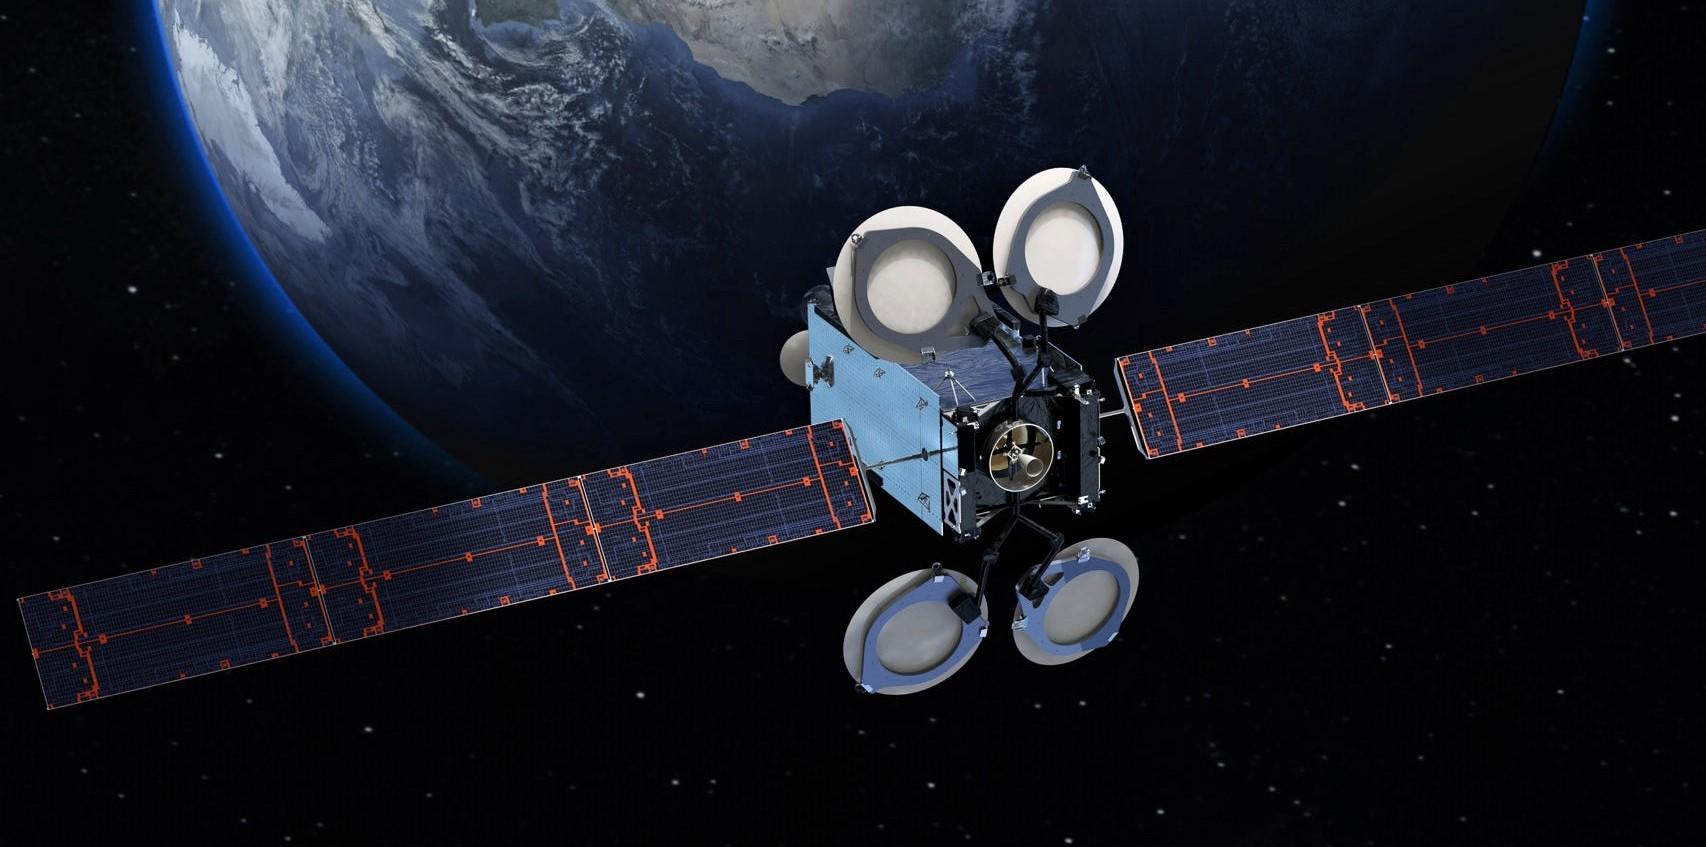 Спутник Amos-17